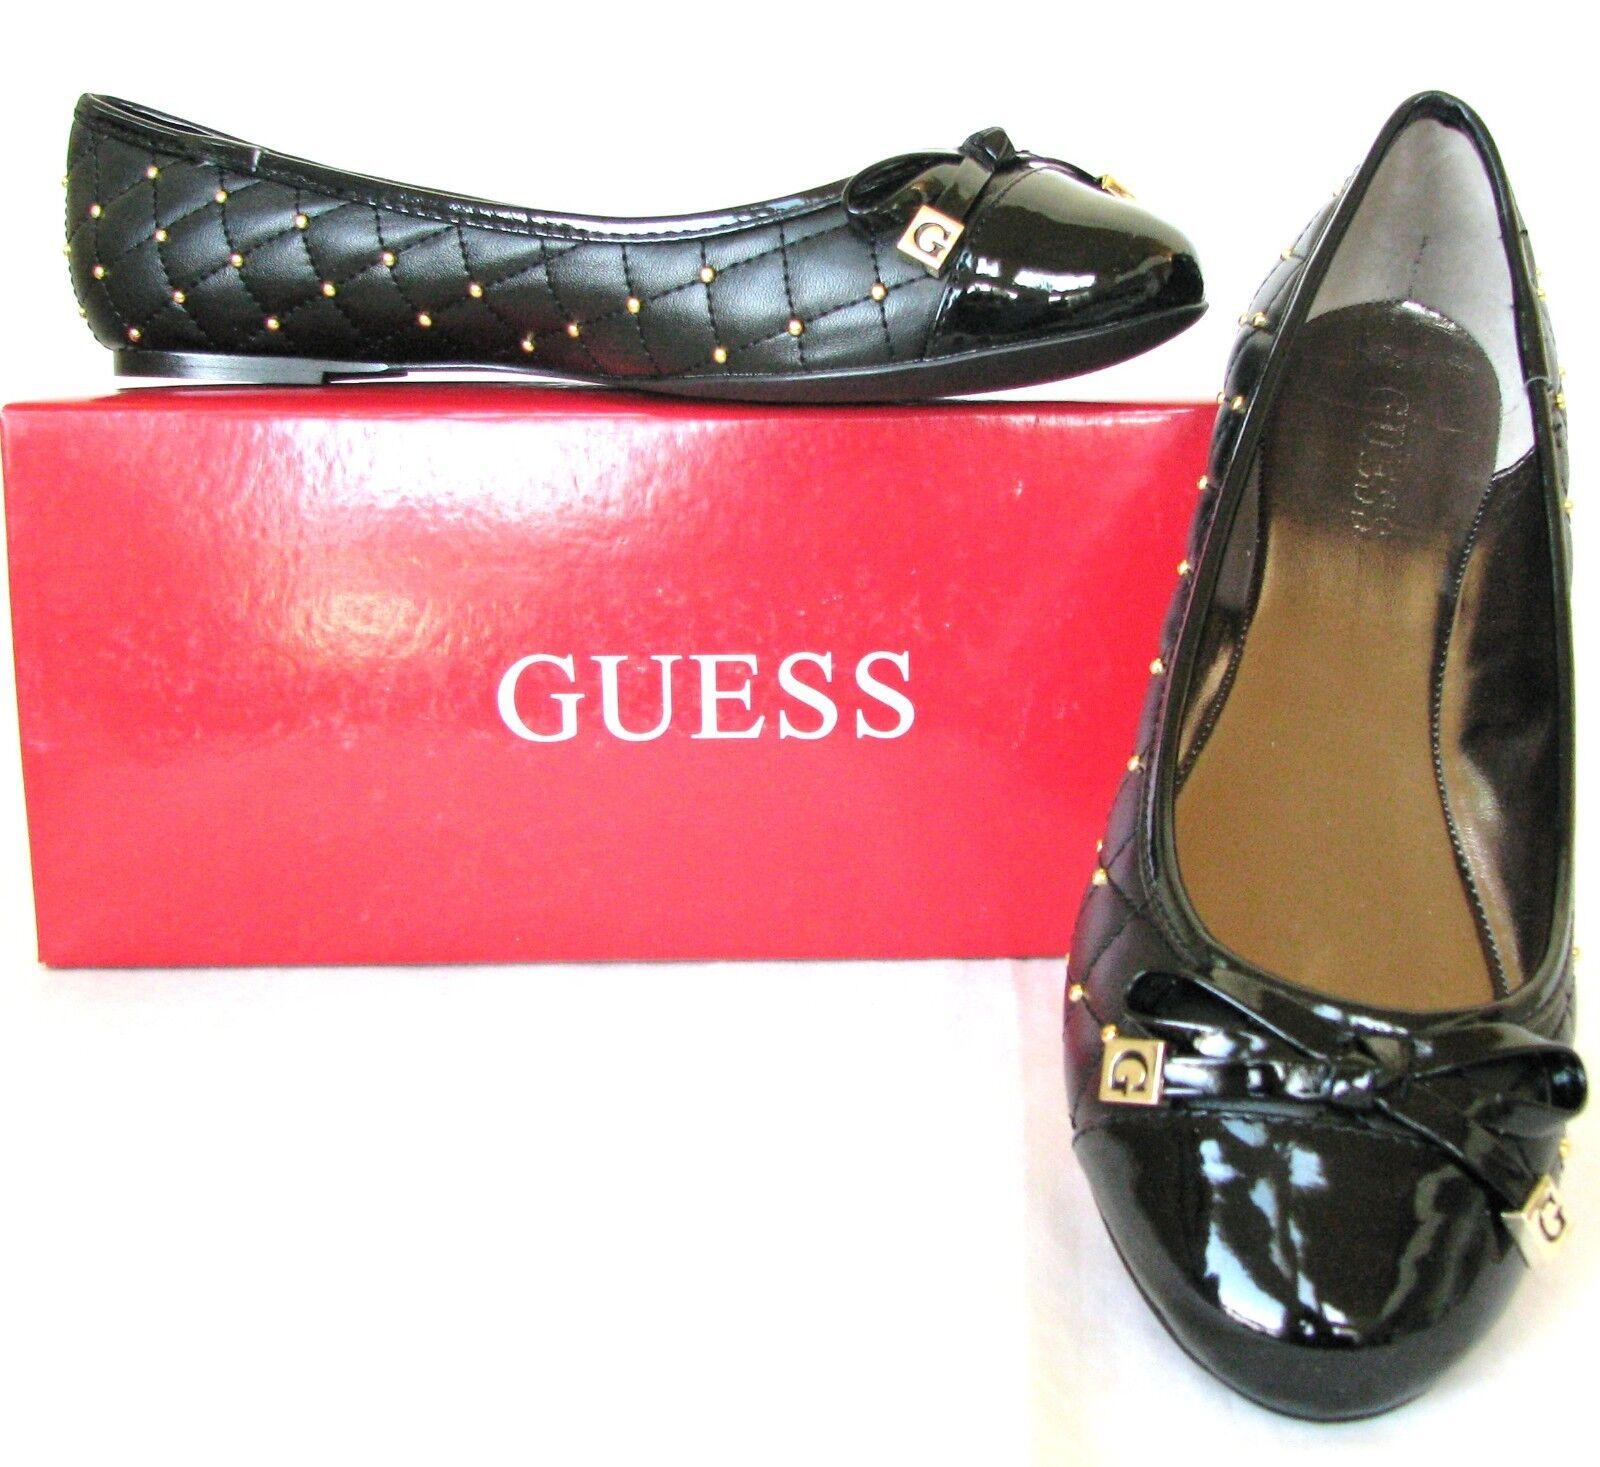 NEU-GUESS GEORGIA BLACK LEATHERETTE+PATENT BOW TOE CAP STUD BALLET FLATS,Schuhe